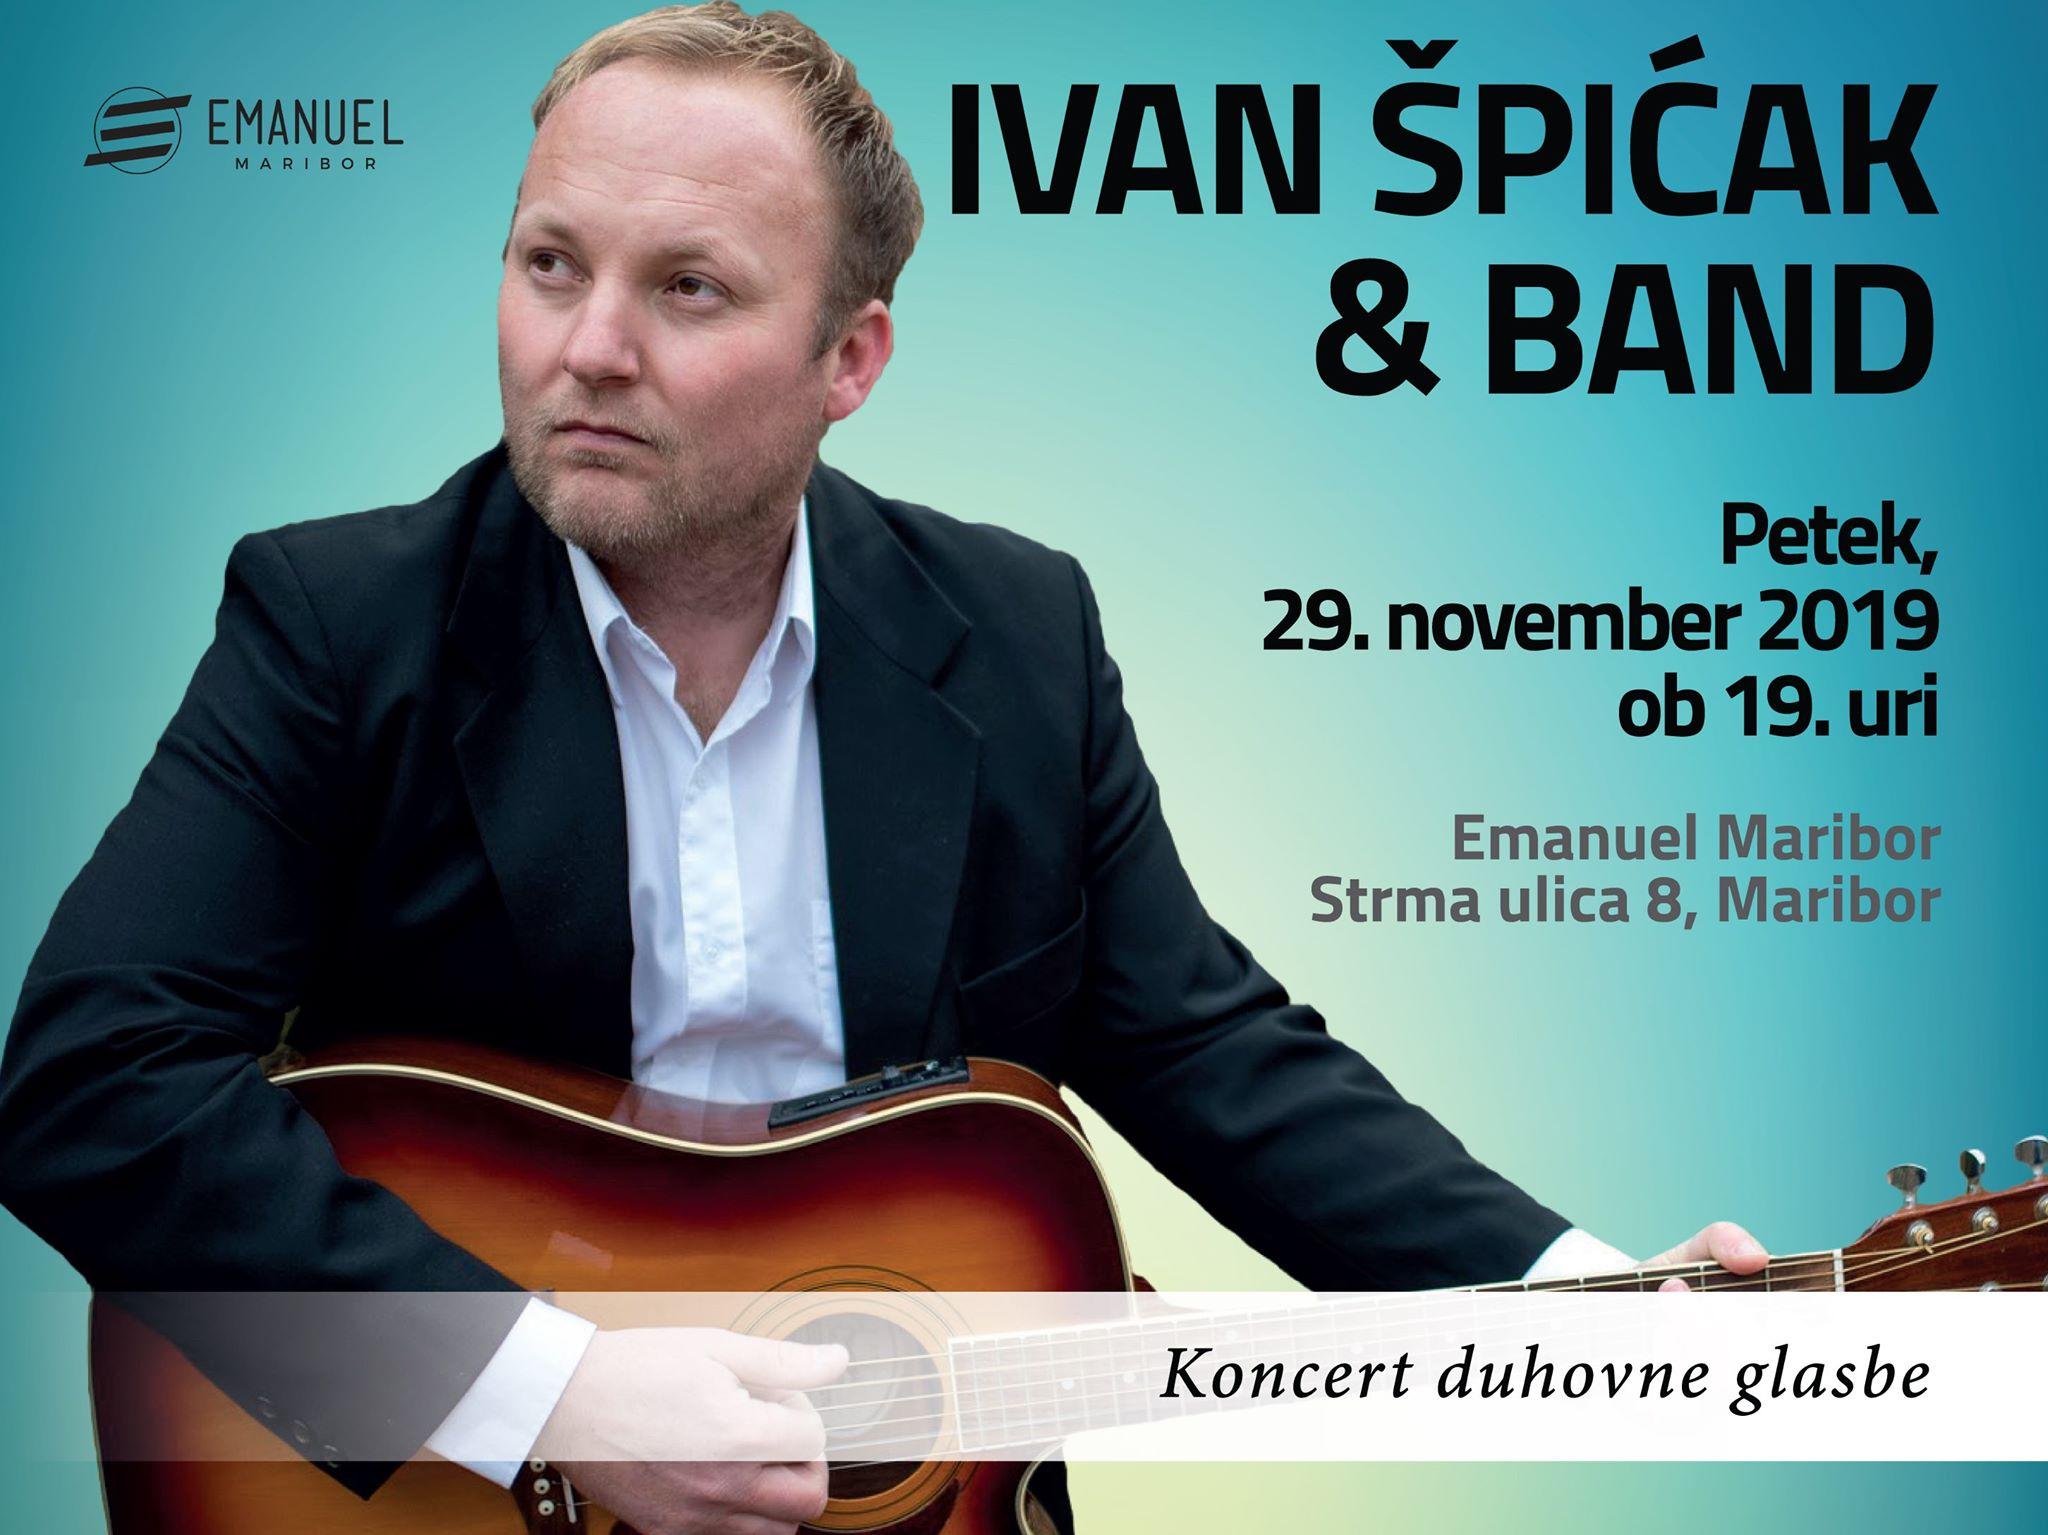 Ivan Špićak & band